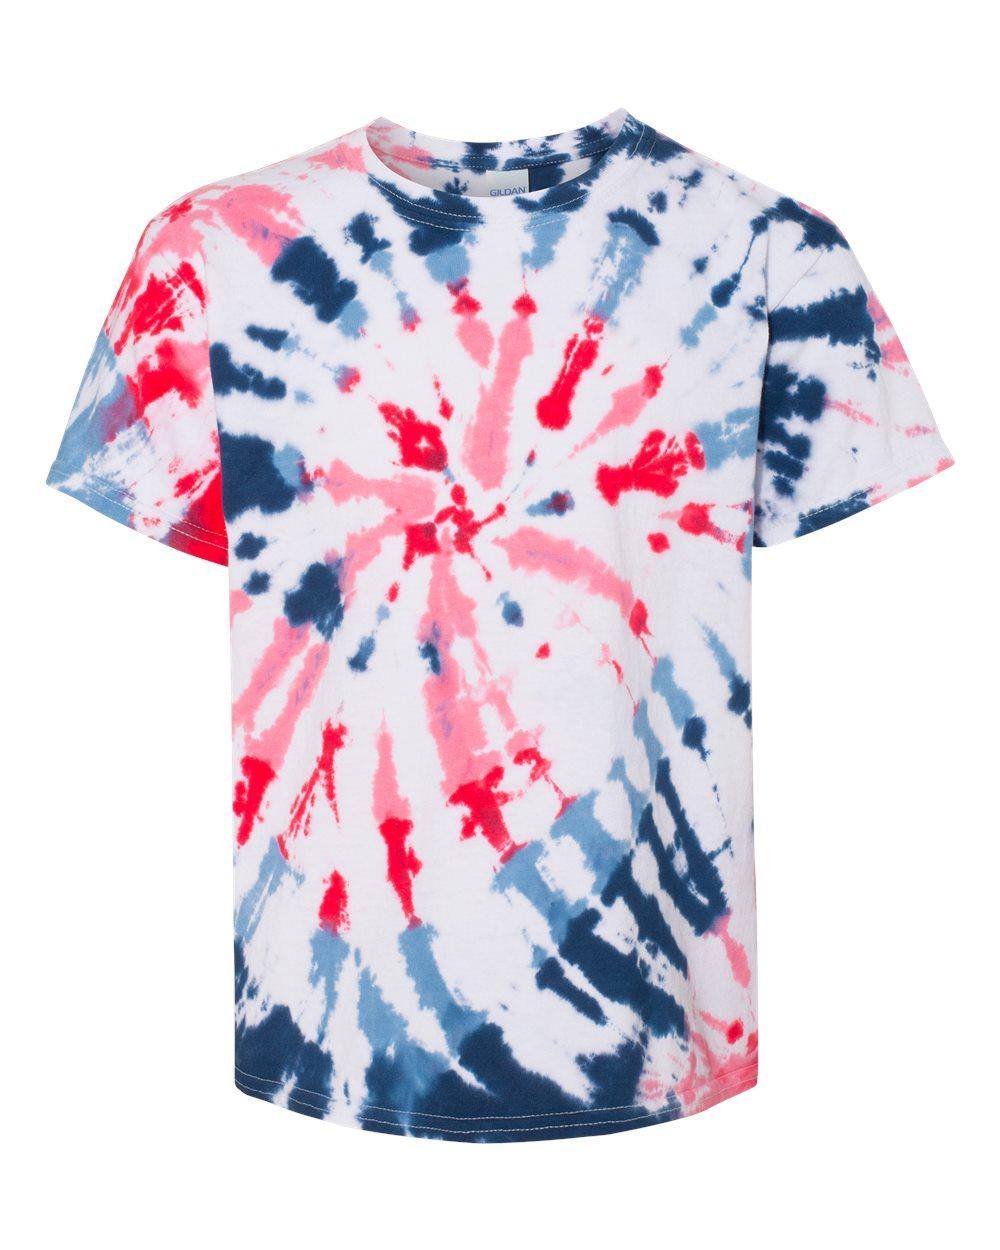 Youth Summer Camp T-Shirt